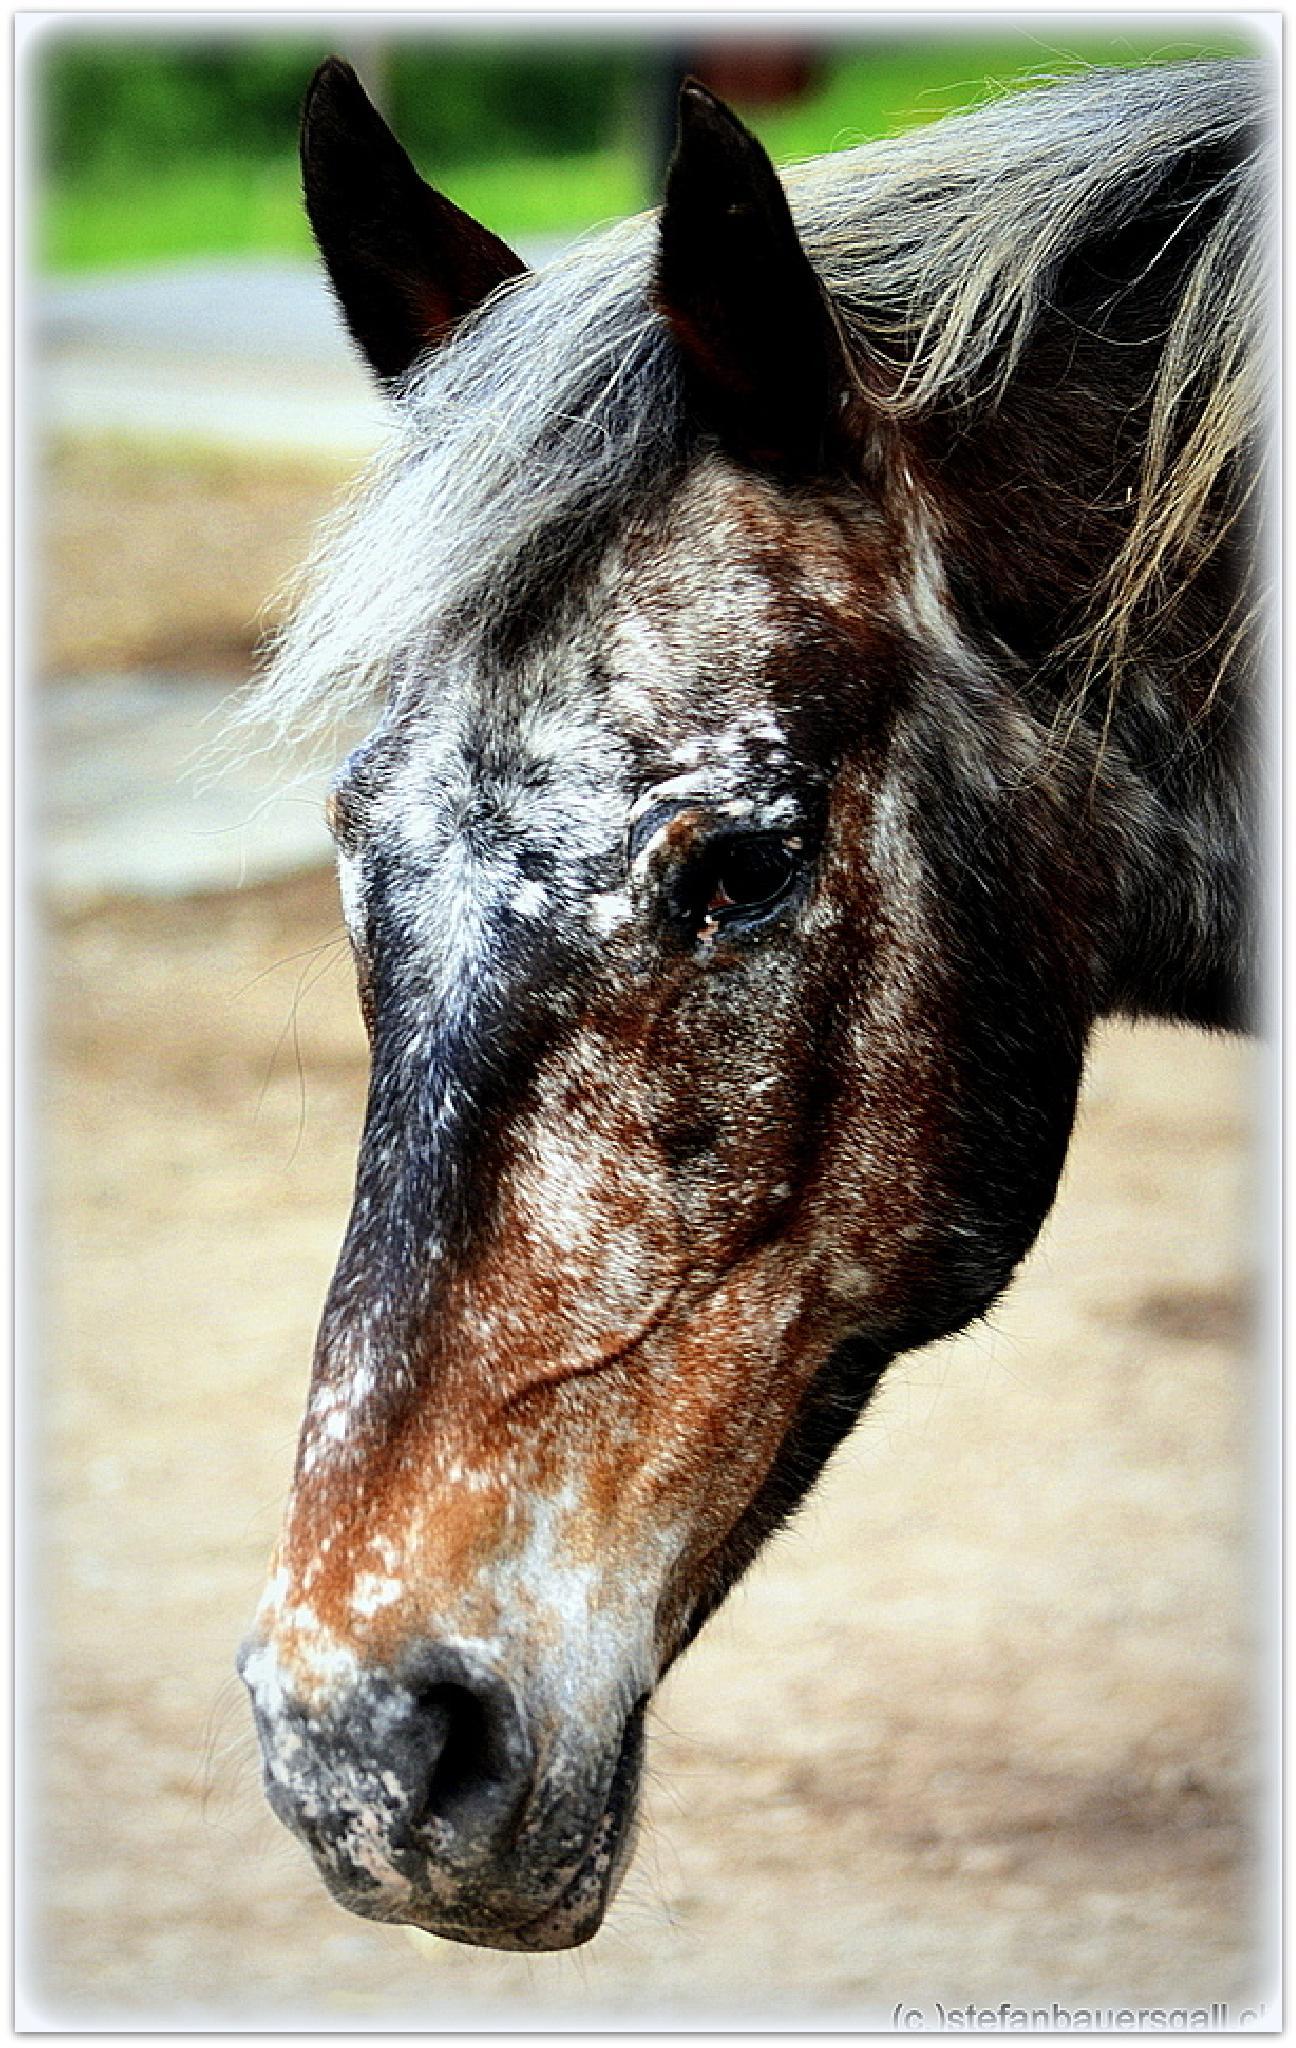 """horseportrait."" by BauerStefan"